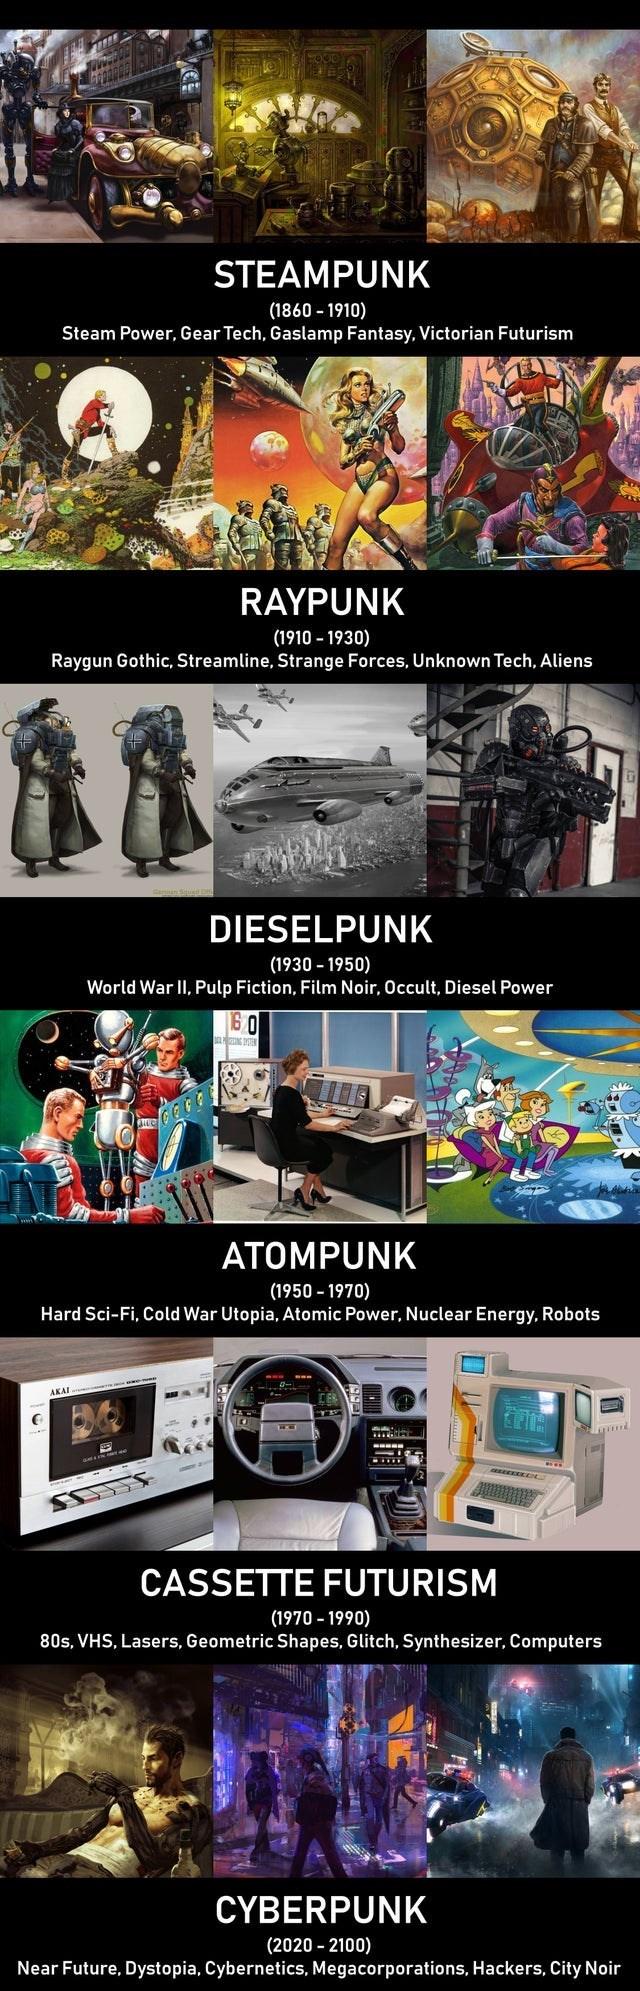 Games - STEAMPUNK (1860 - 1910) Steam Power, Gear Tech, Gaslamp Fantasy, Victorian Futurism RAYPUNK (1910 - 1930) Raygun Gothic, Streamline, Strange Forces, Unknown Tech, Aliens DIESELPUNK (1930 - 1950) World War II, Pulp Fiction, Film Noir, Occult, Diesel Power 60 ATOMPUNK (1950 – 1970) Hard Sci-Fi, Cold War Utopia, Atomic Power, Nuclear Energy, Robots AKAL CASSETTE FUTURISM (1970 - 1990) 80s, VHS, Lasers, Geometric Shapes, Glitch, Synthesizer, Computers CYBERPUNK (2020 - 2100) Near Future, Dys